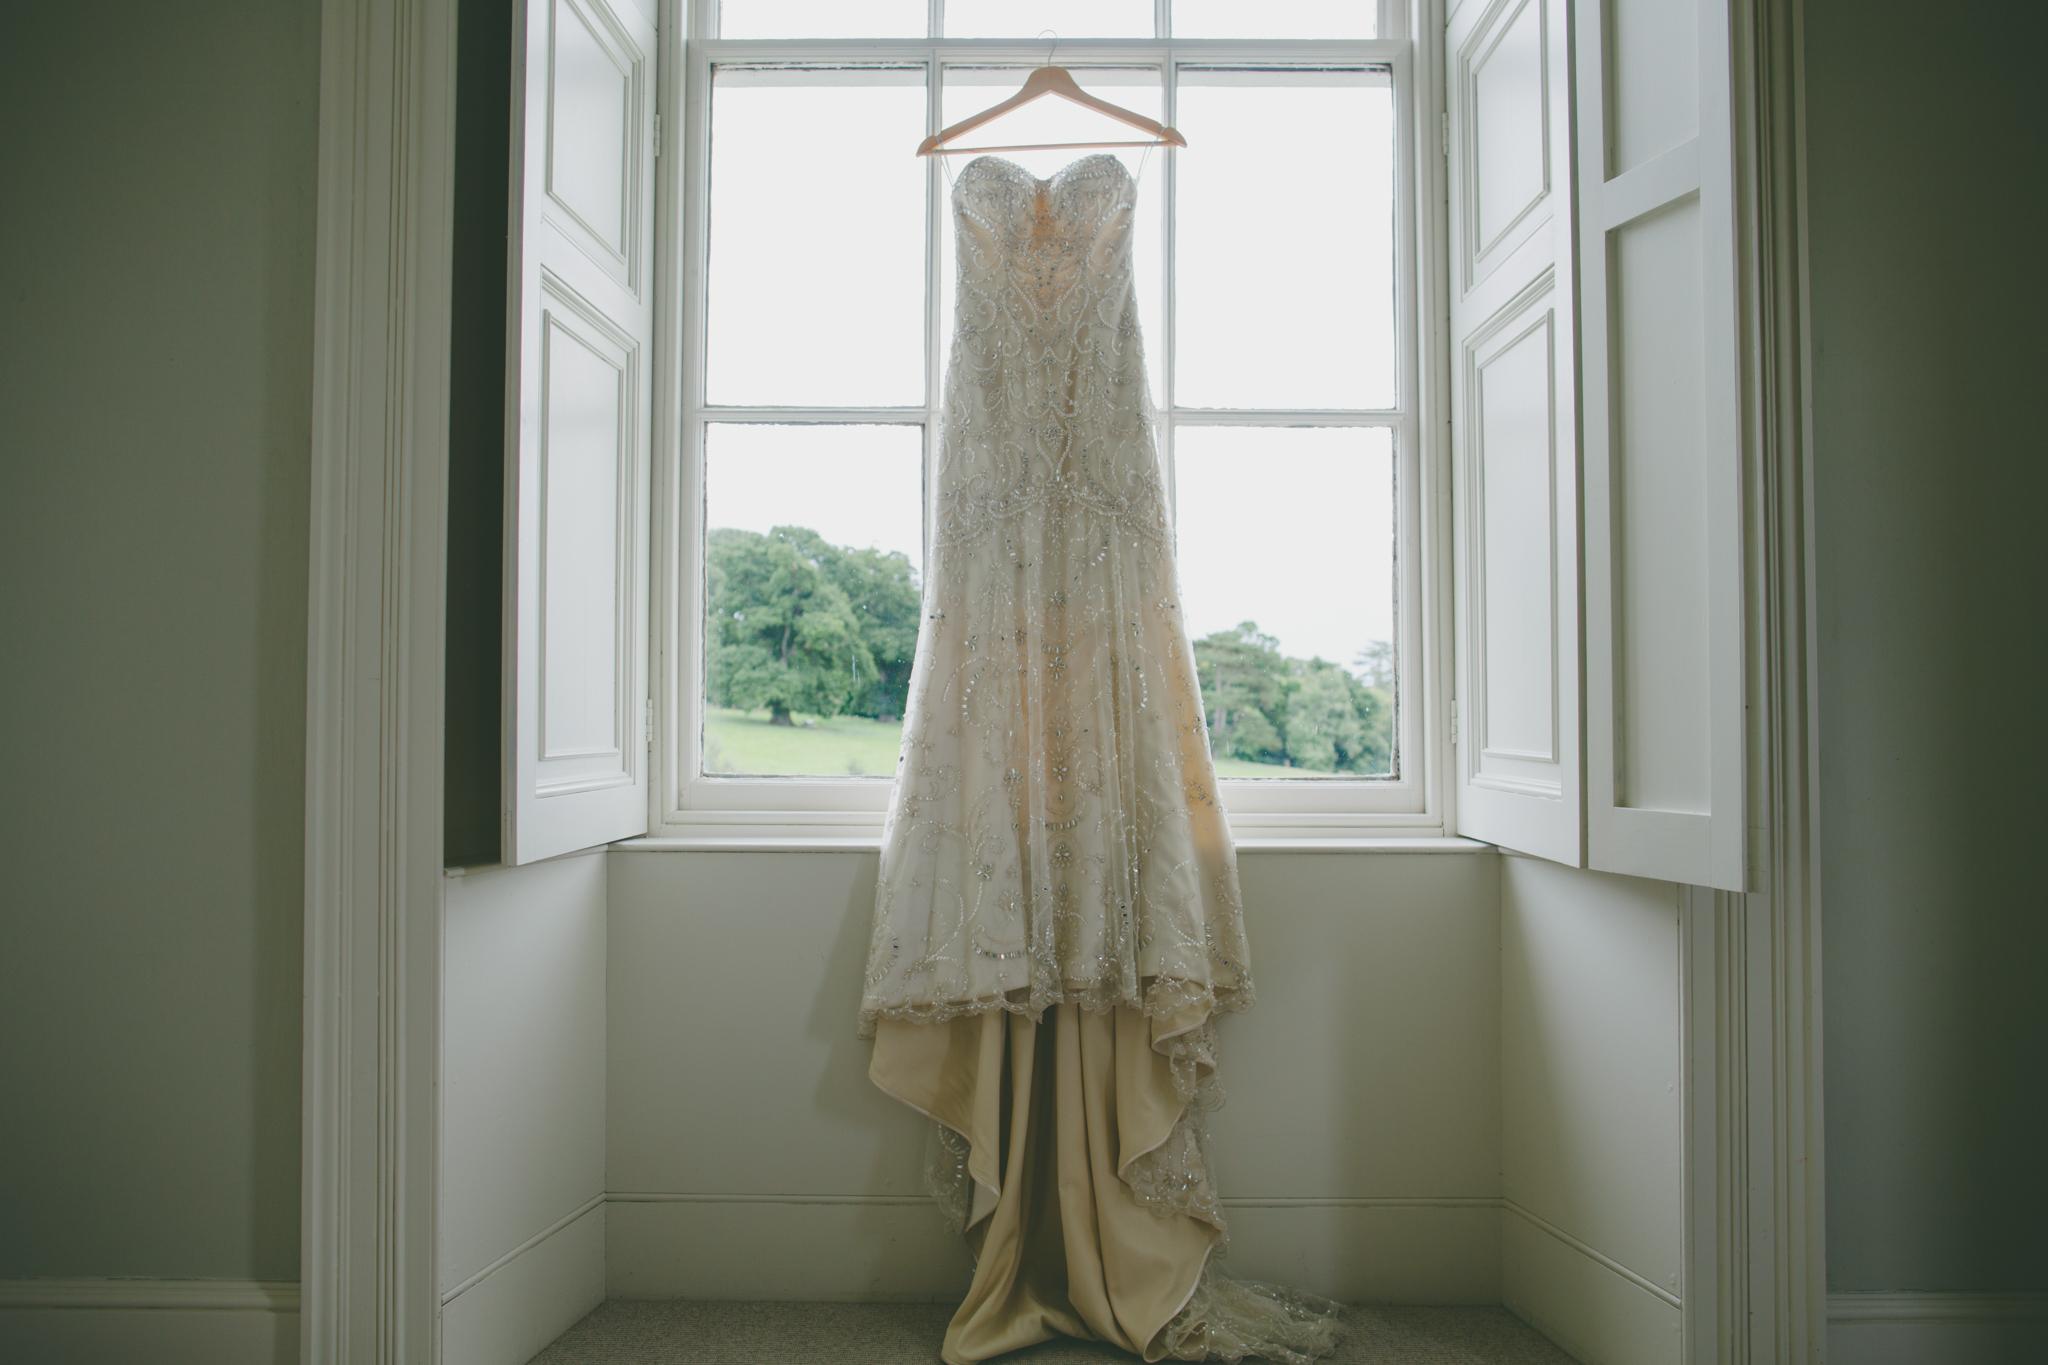 Amy Sampson   Creative Documentary Wedding Photographer   Ishani and Iain's Wedding at Pyne's House, Exeter, Devon